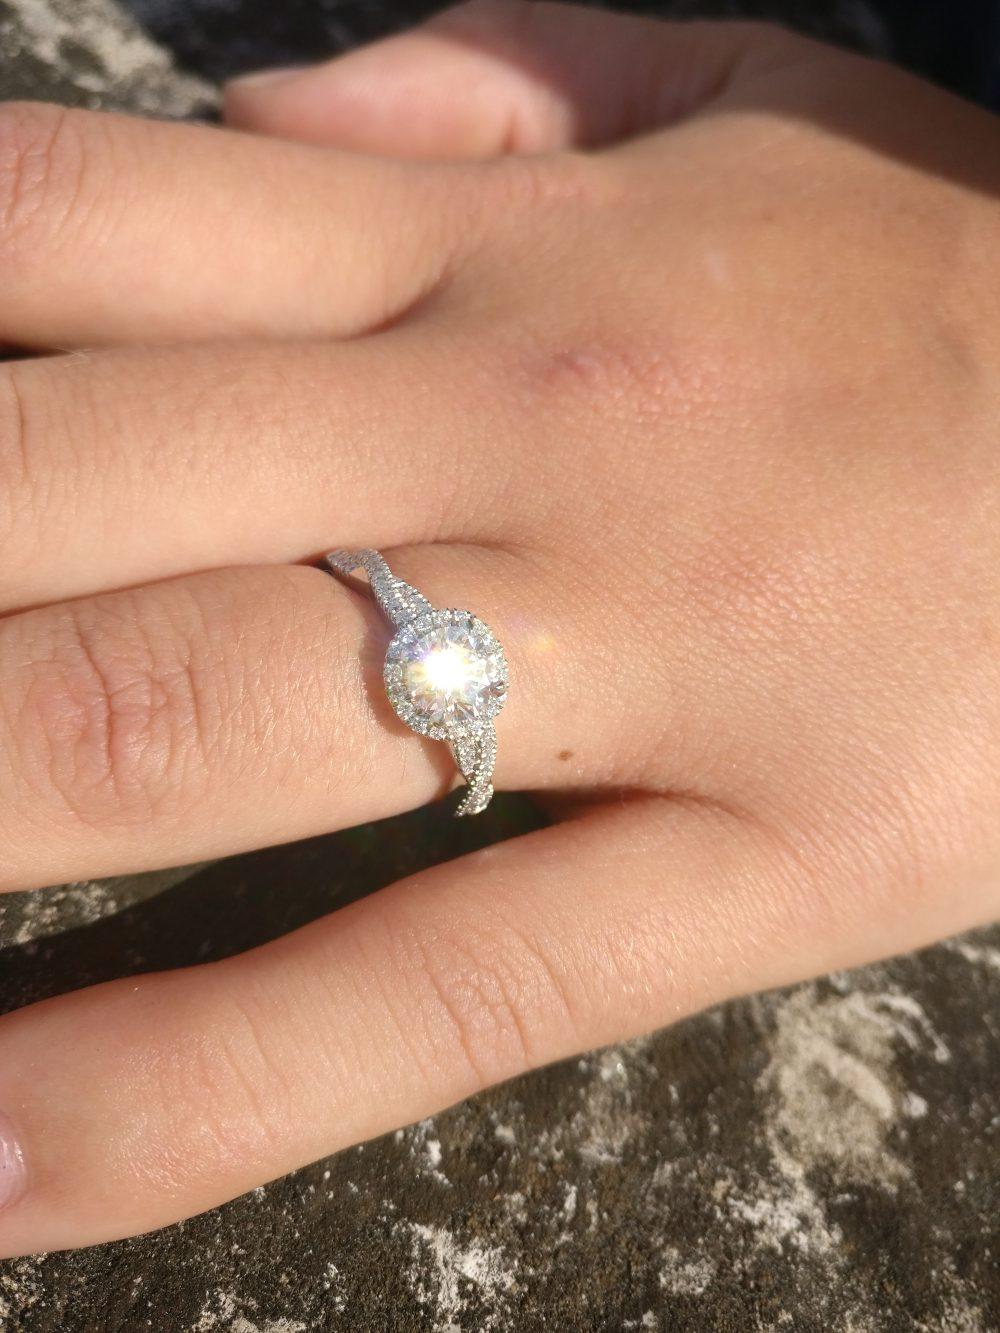 fairytale inspired engagement ring design